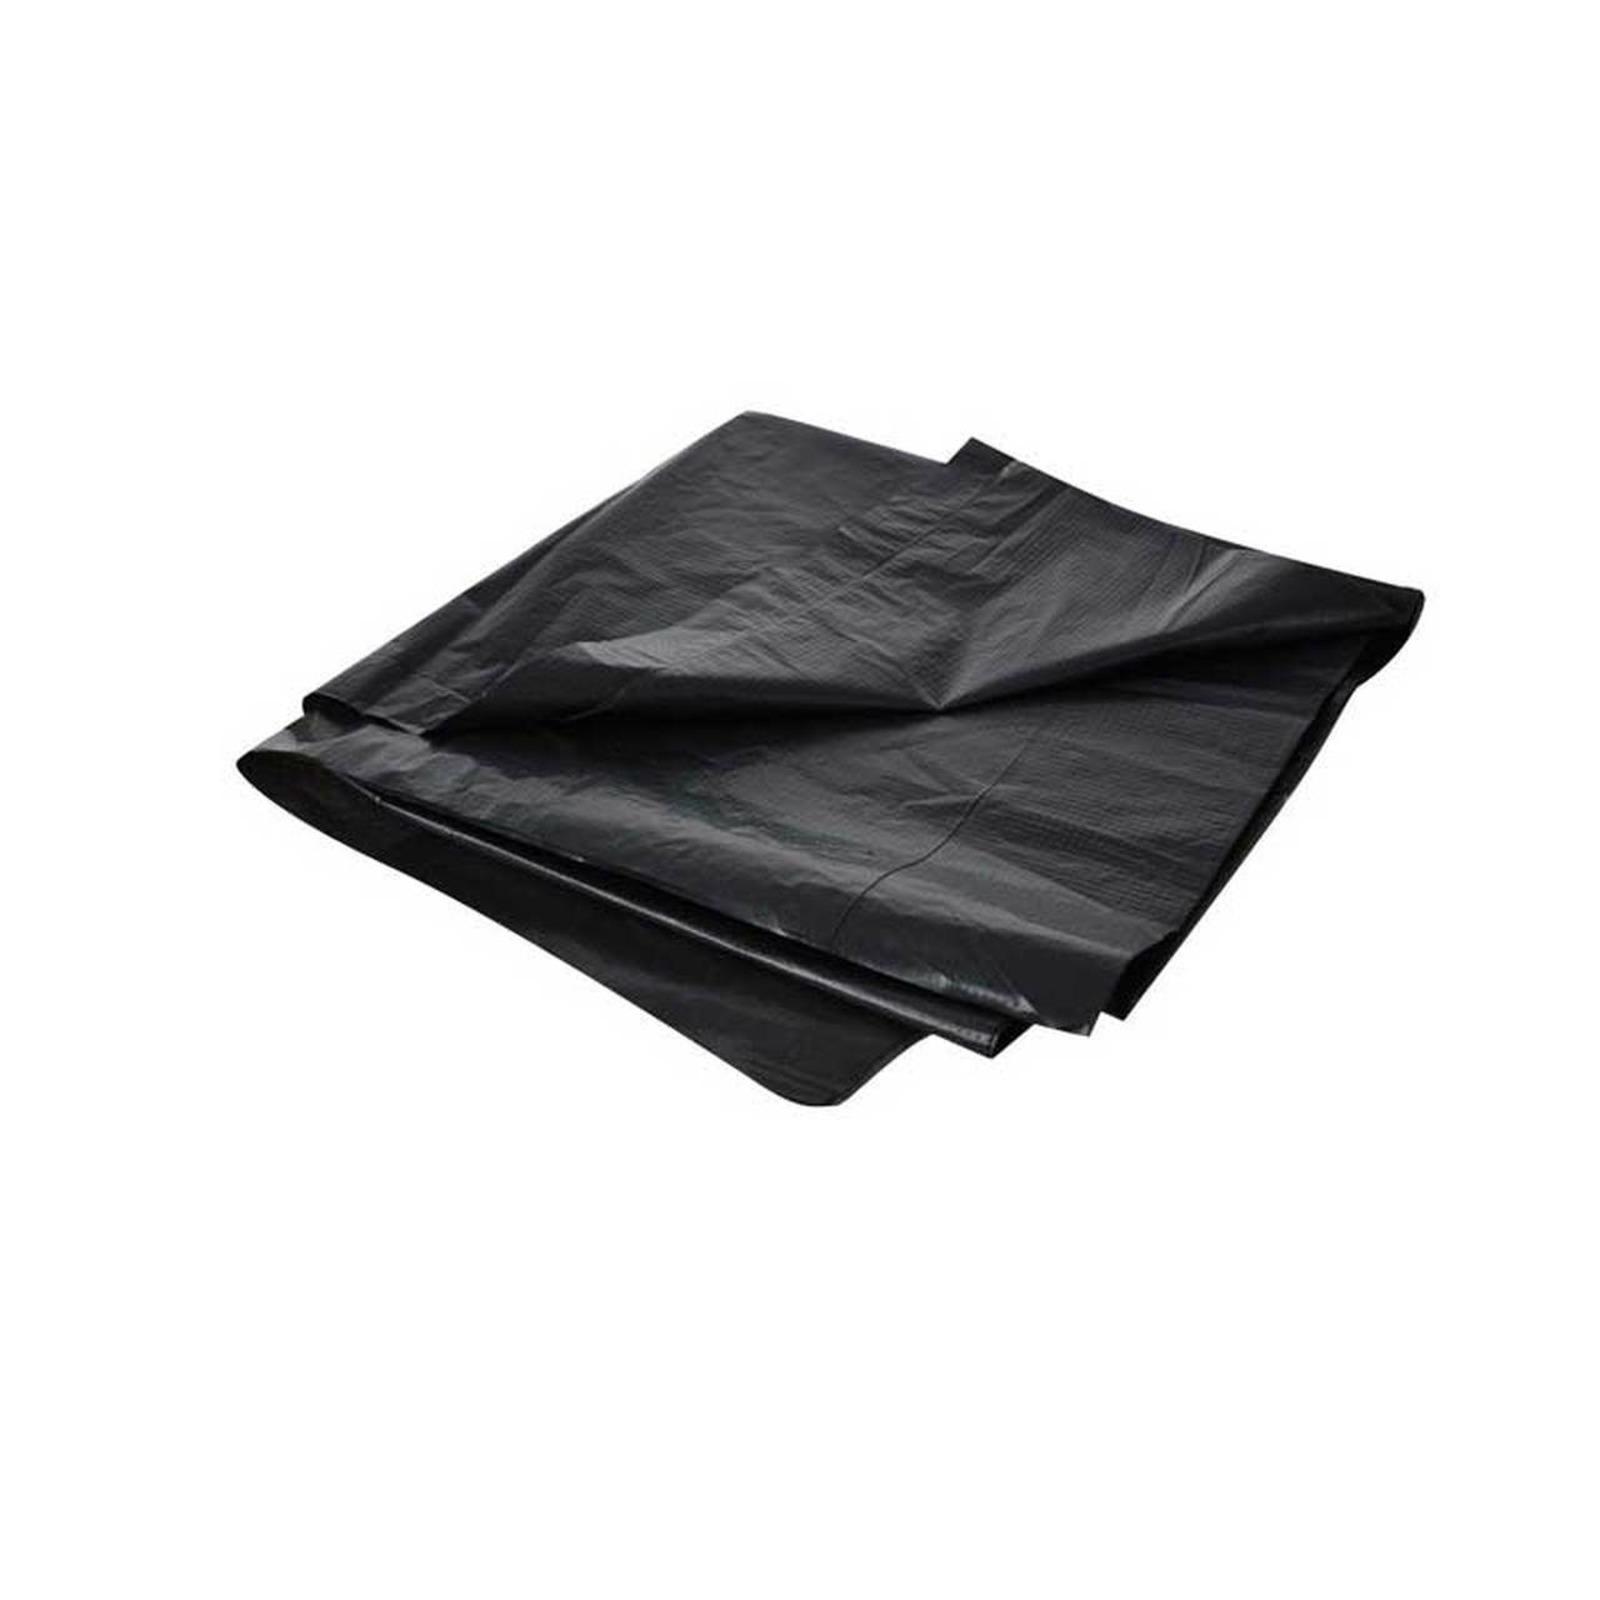 MTRADE Black Plastic Trash Bags (30 Inch x 34 Inch)